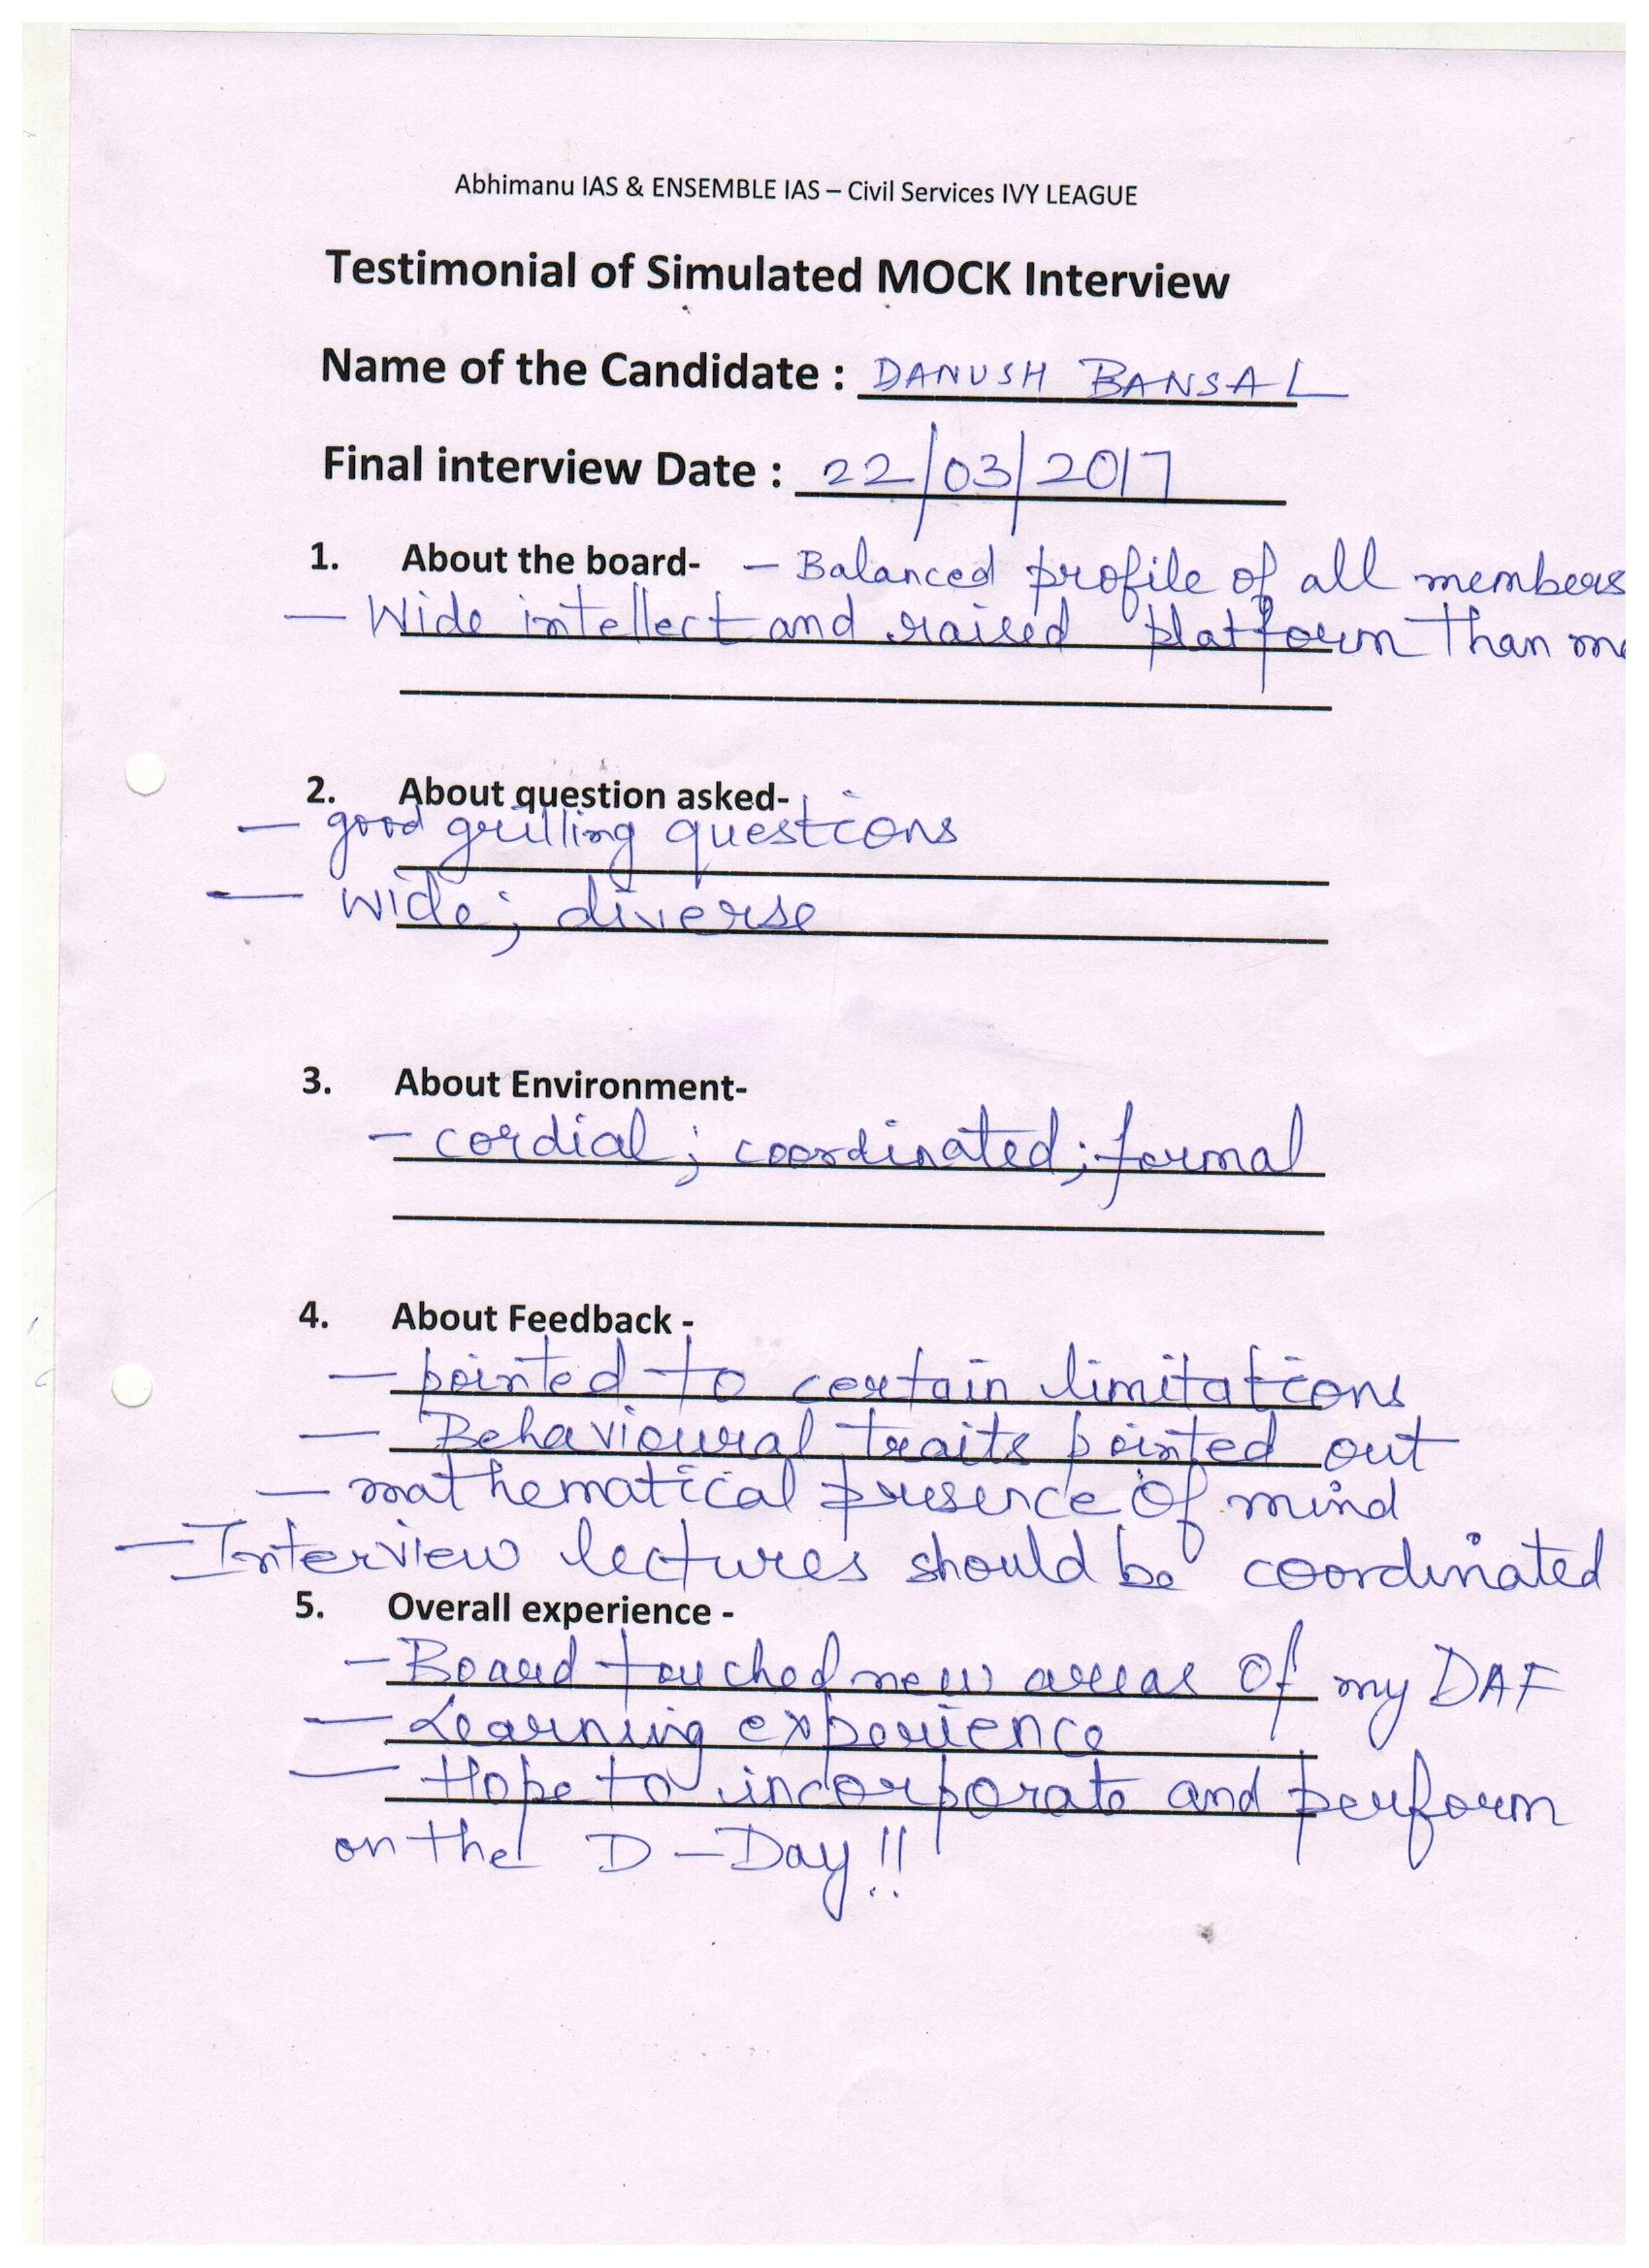 Interview Testimonial By- Dhanush Bansal